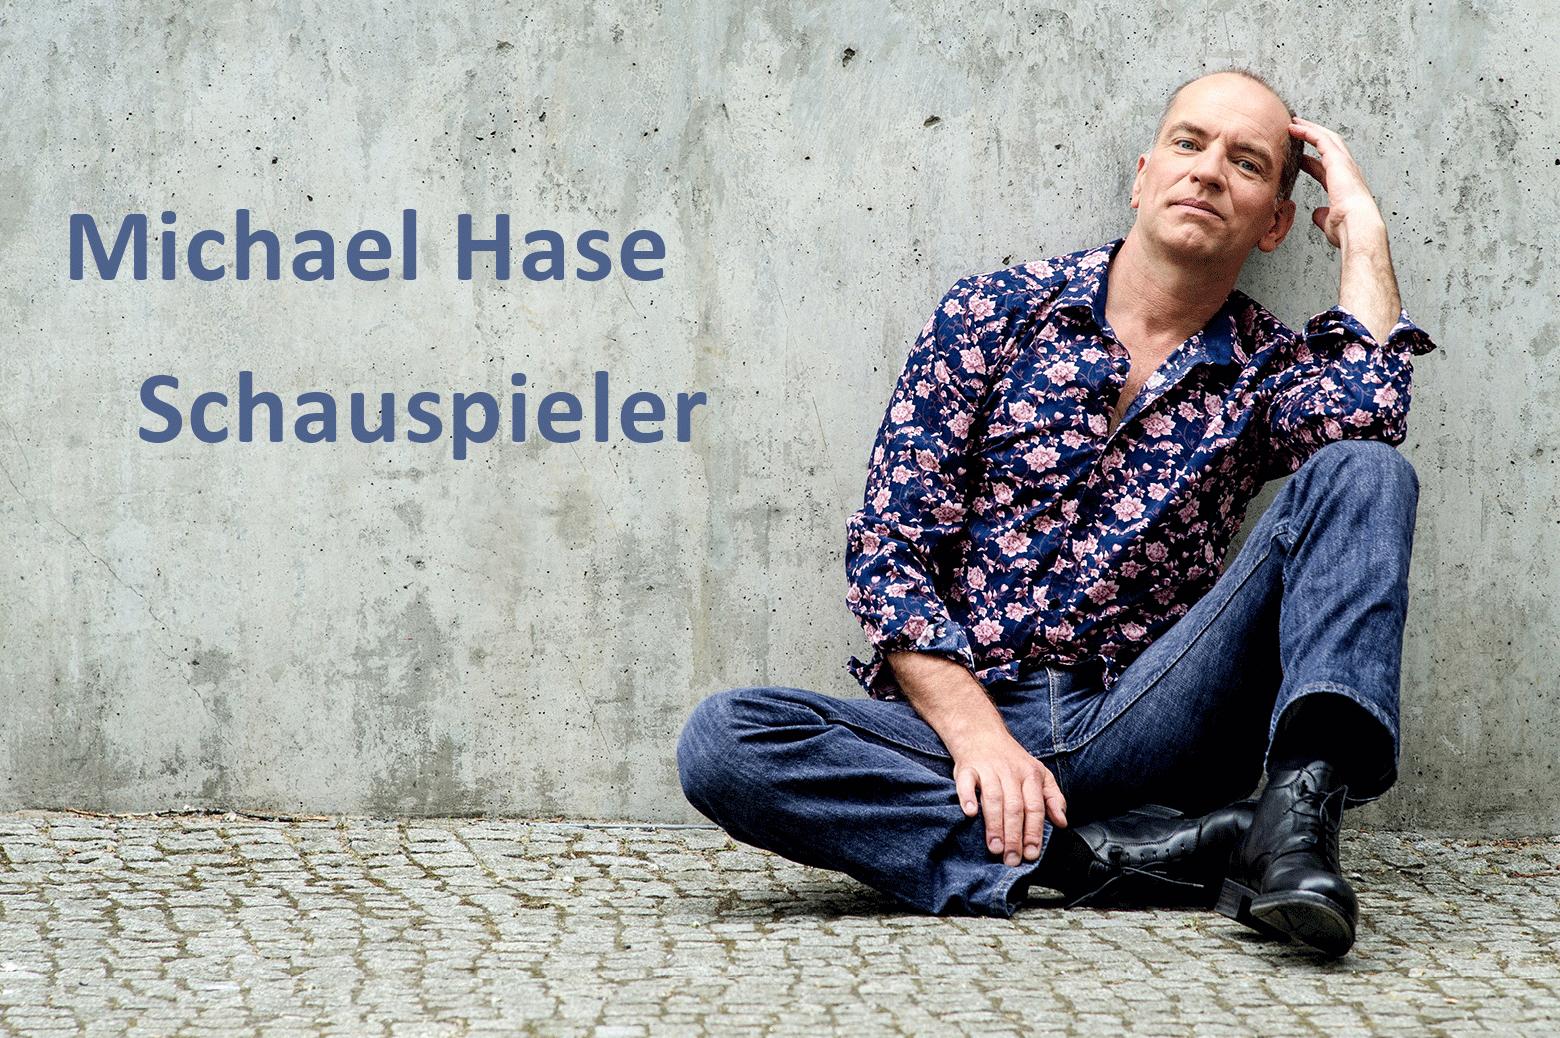 Michael Hase